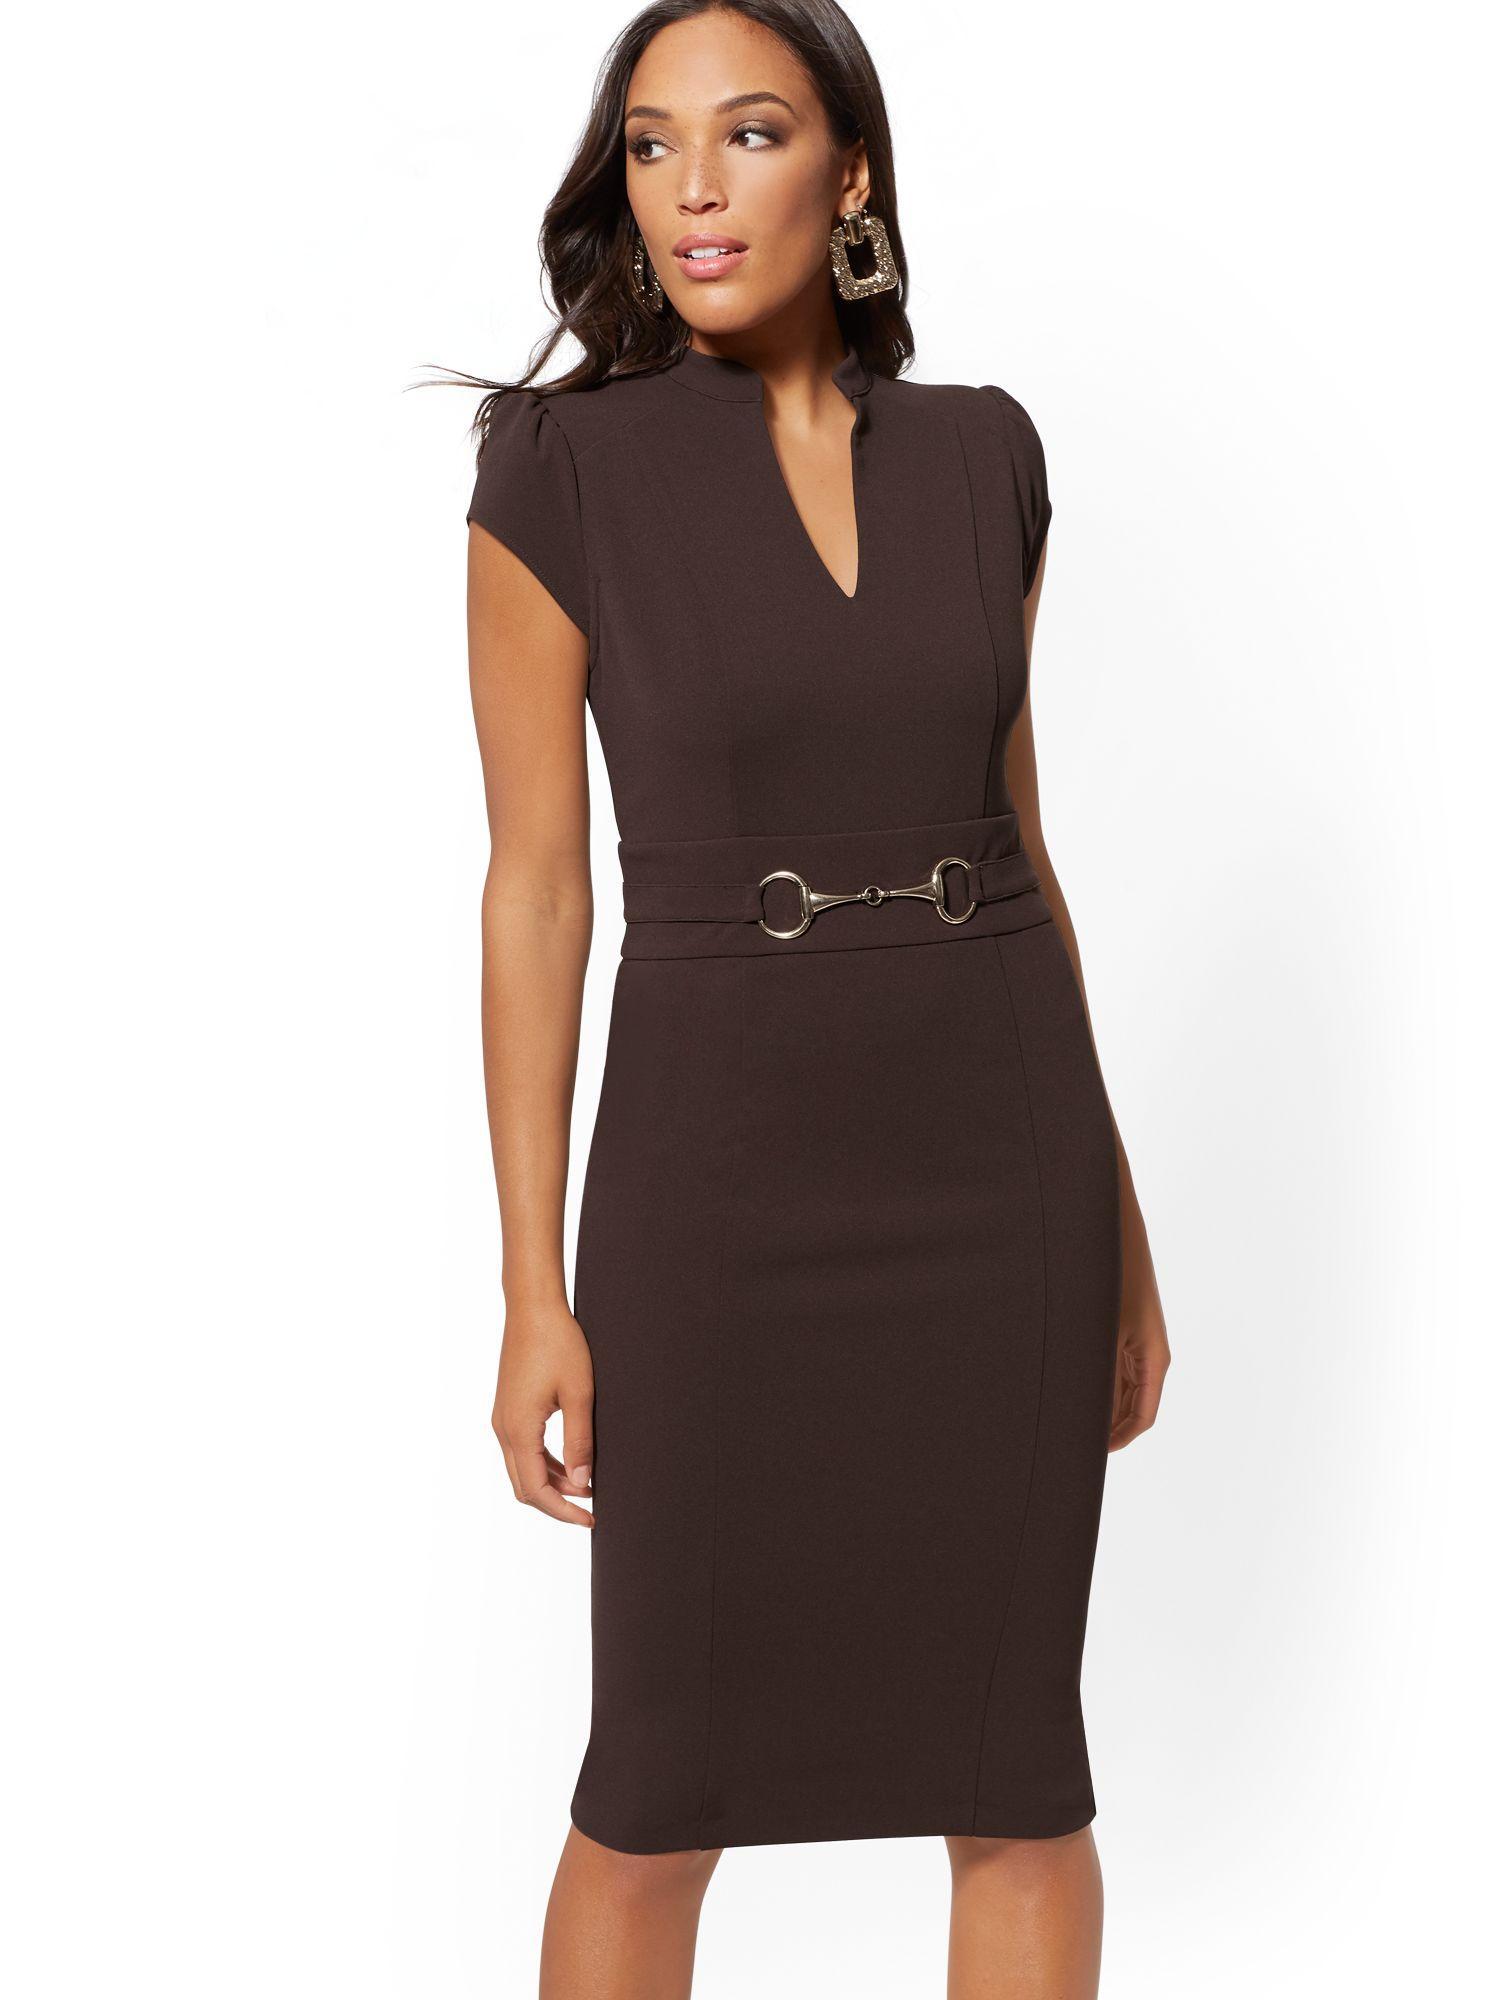 b4ec2bd76 New York & Company. Women's Brown Horsebit-accent Sheath Dress - Magic Crepe  ...